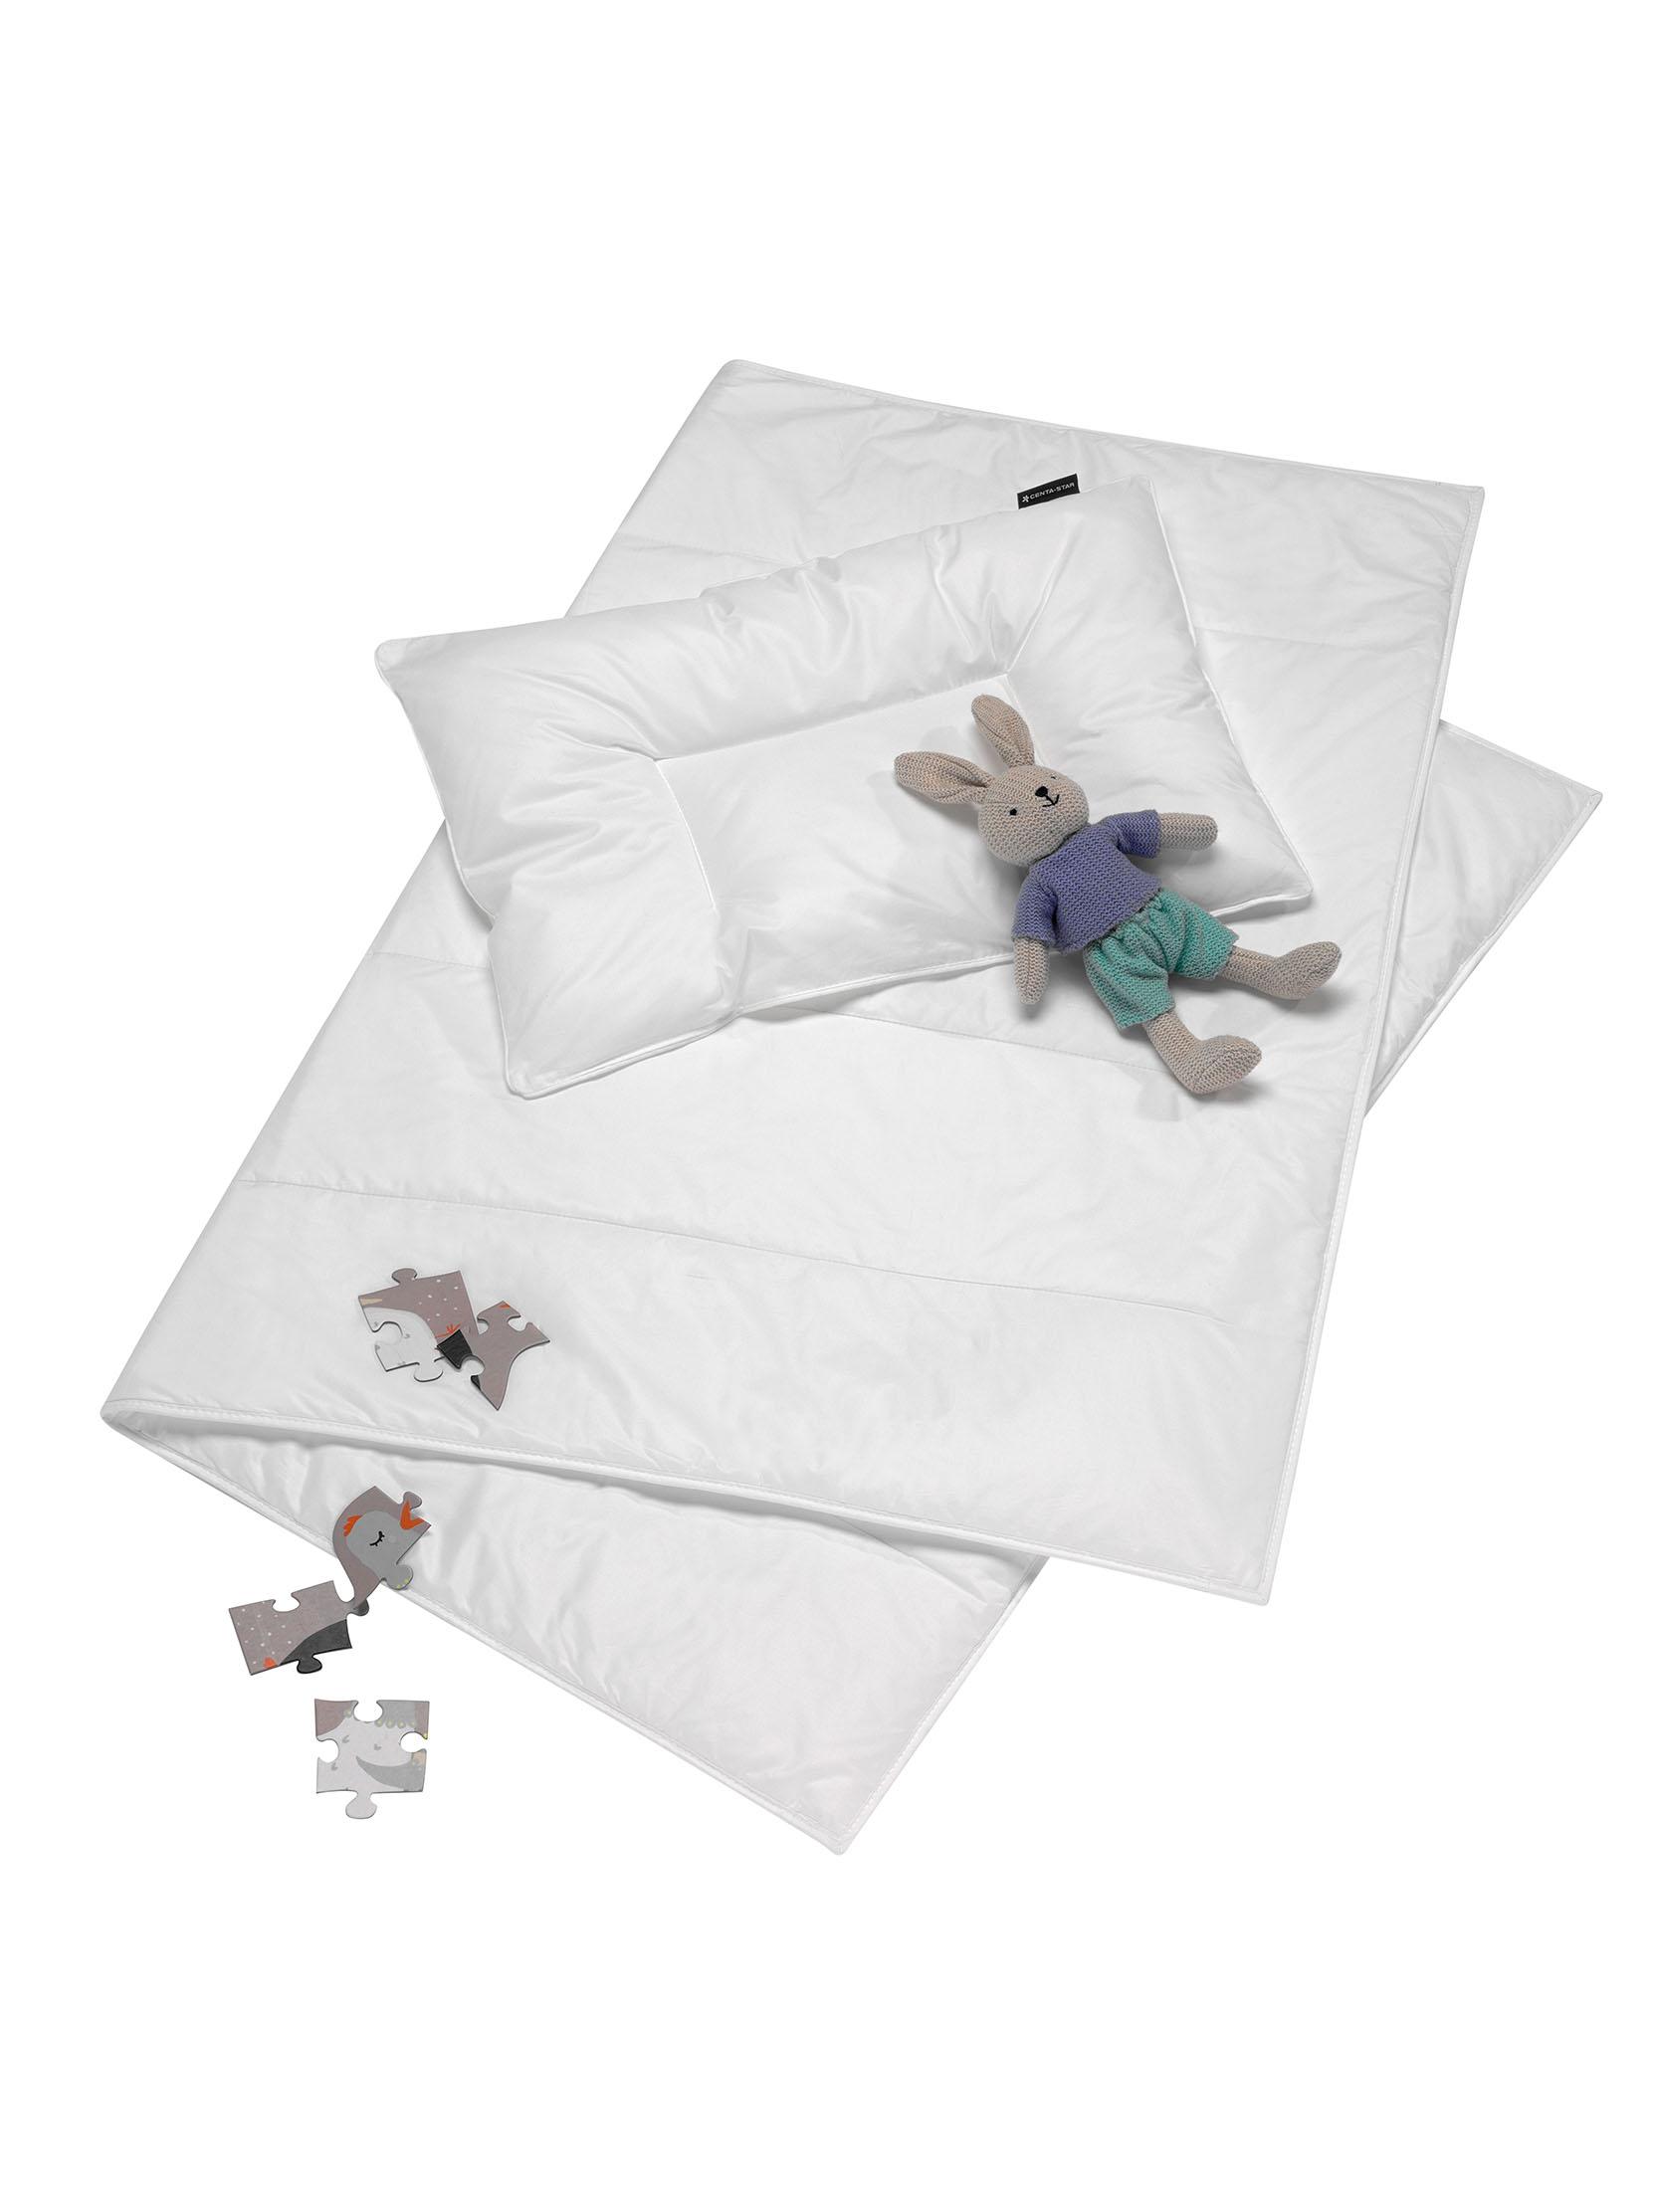 Centa-Star Kinder Set Aqua-Aktiv 100x135 cm und Flachkissen 40x60 cm